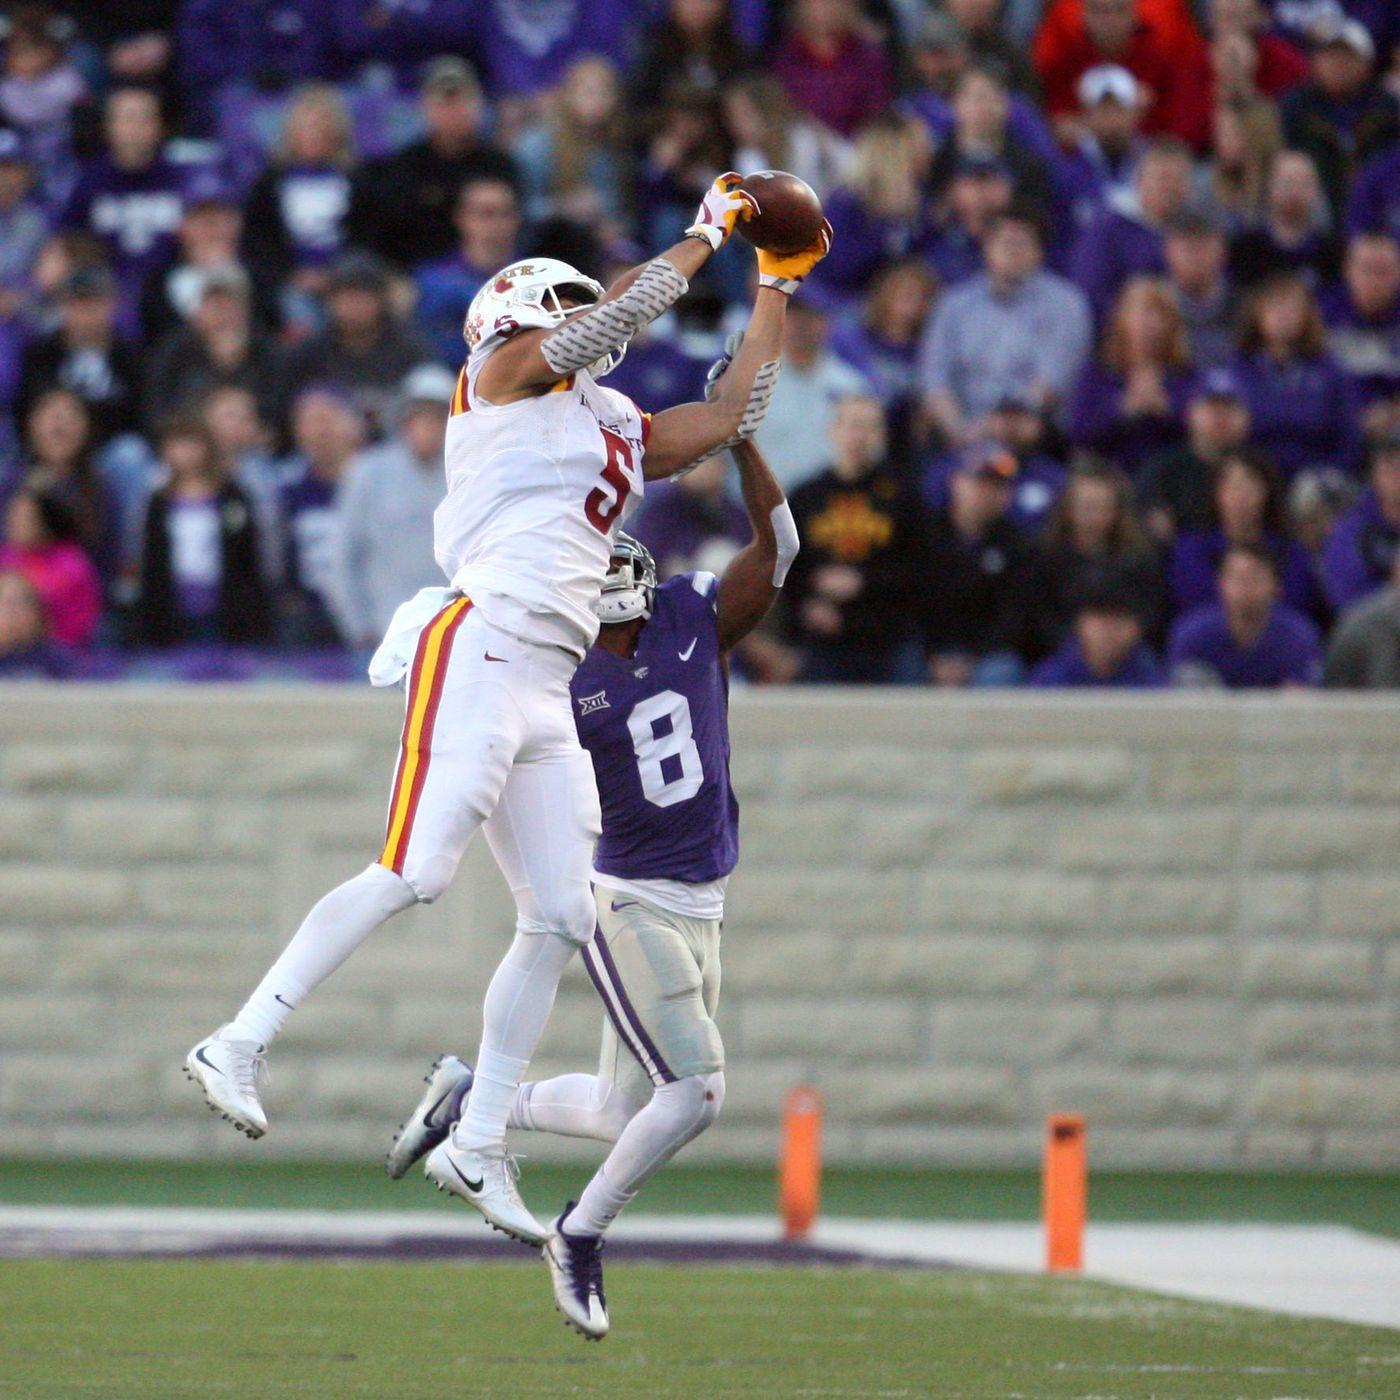 2018 Nfl Draft Prospect Profile Allen Lazard Wr Iowa State Big Blue View